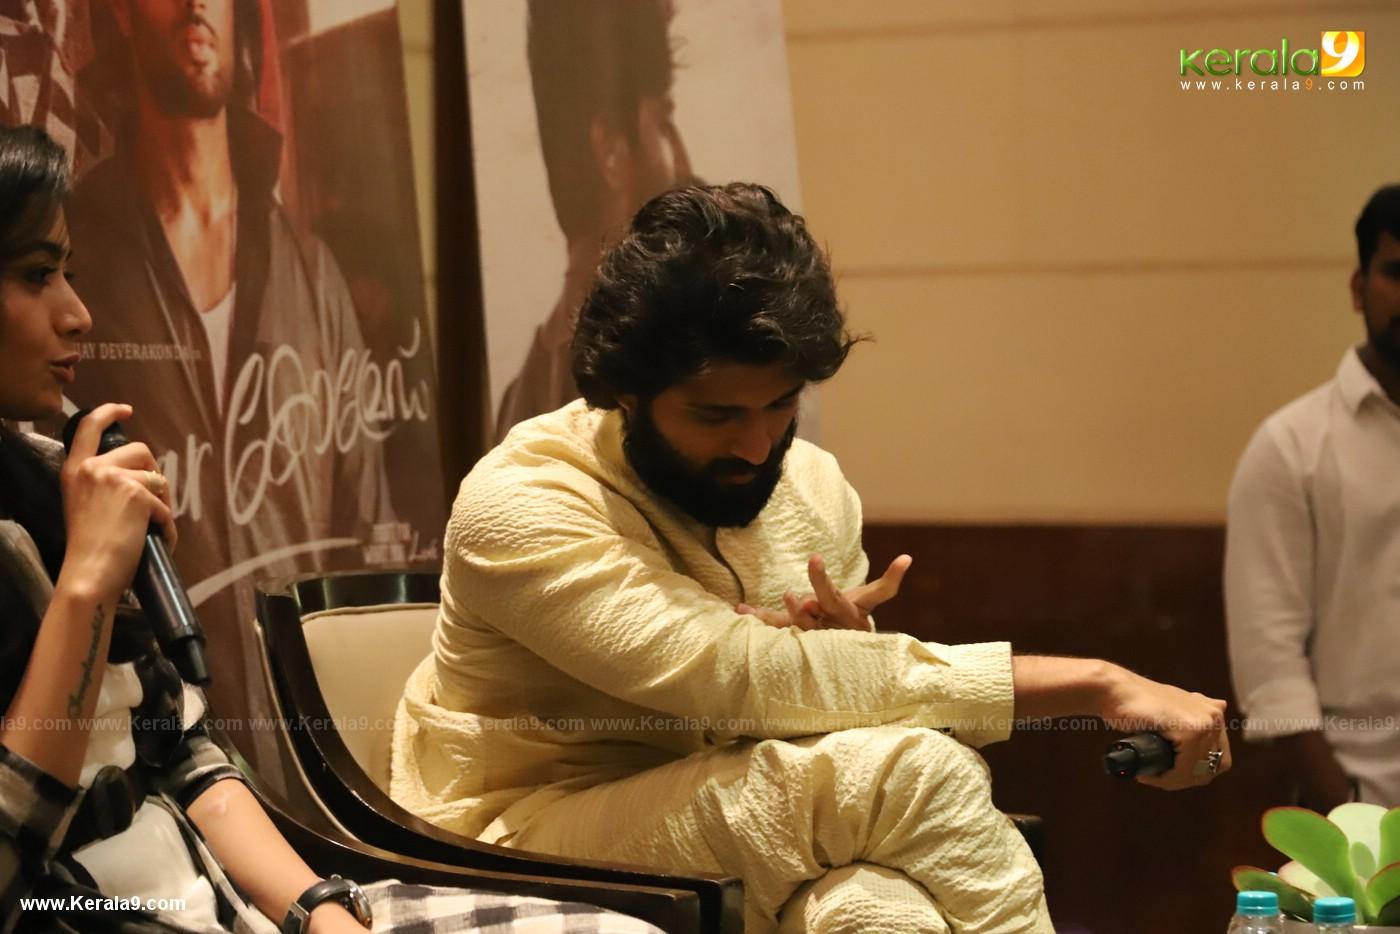 Dear Comrade movie premotion kerala kochi photos - Kerala9.com